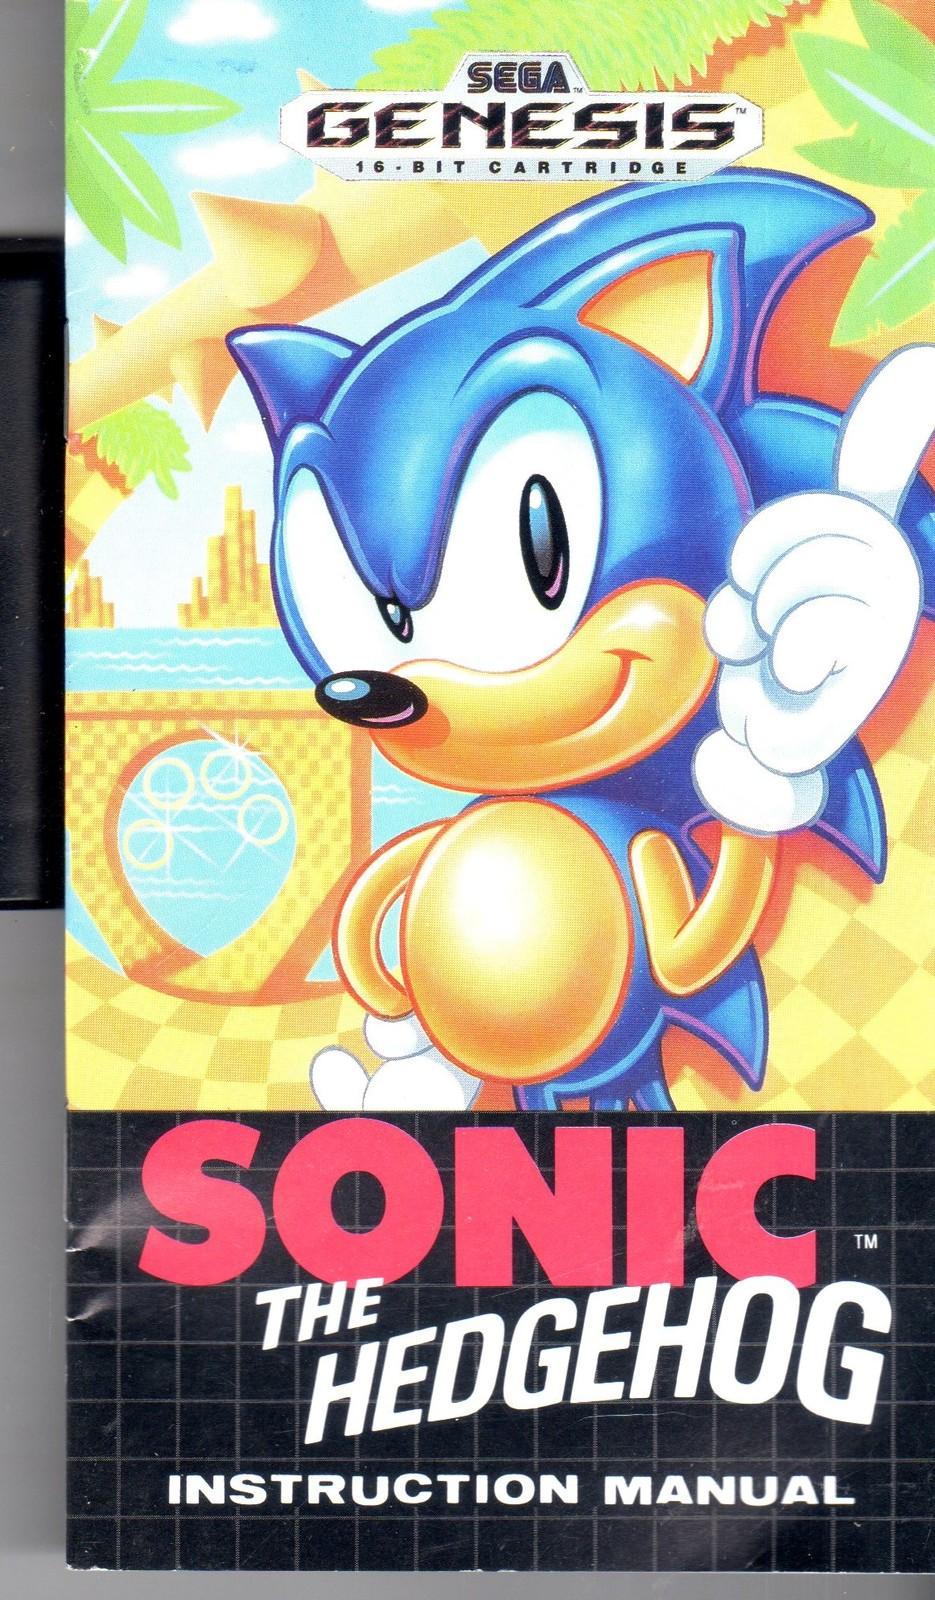 Sega Genesis Sonic The Hedgehog 1991